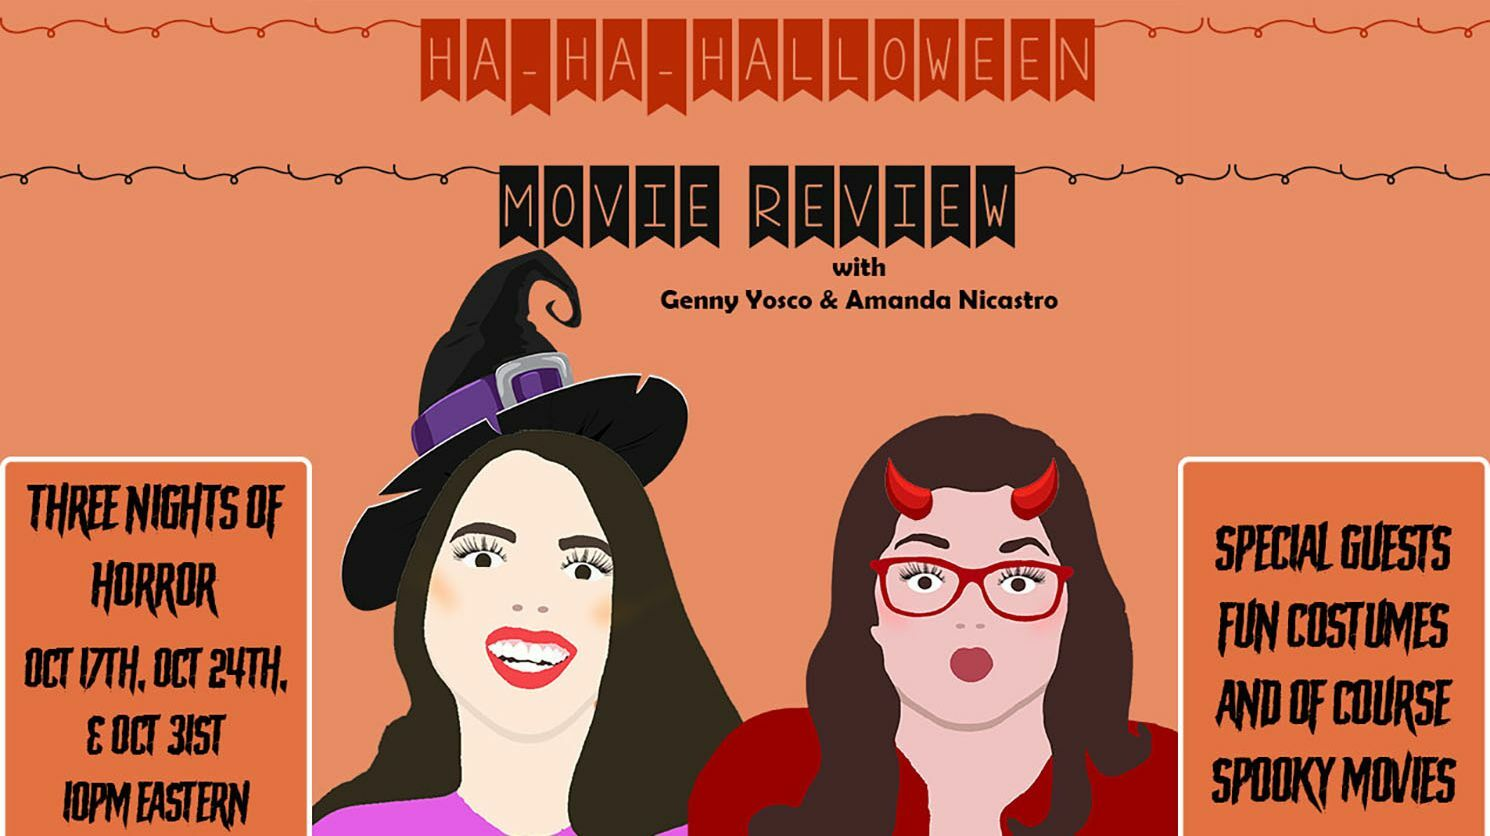 Ha-Ha-Halloween Movie Review -- Online